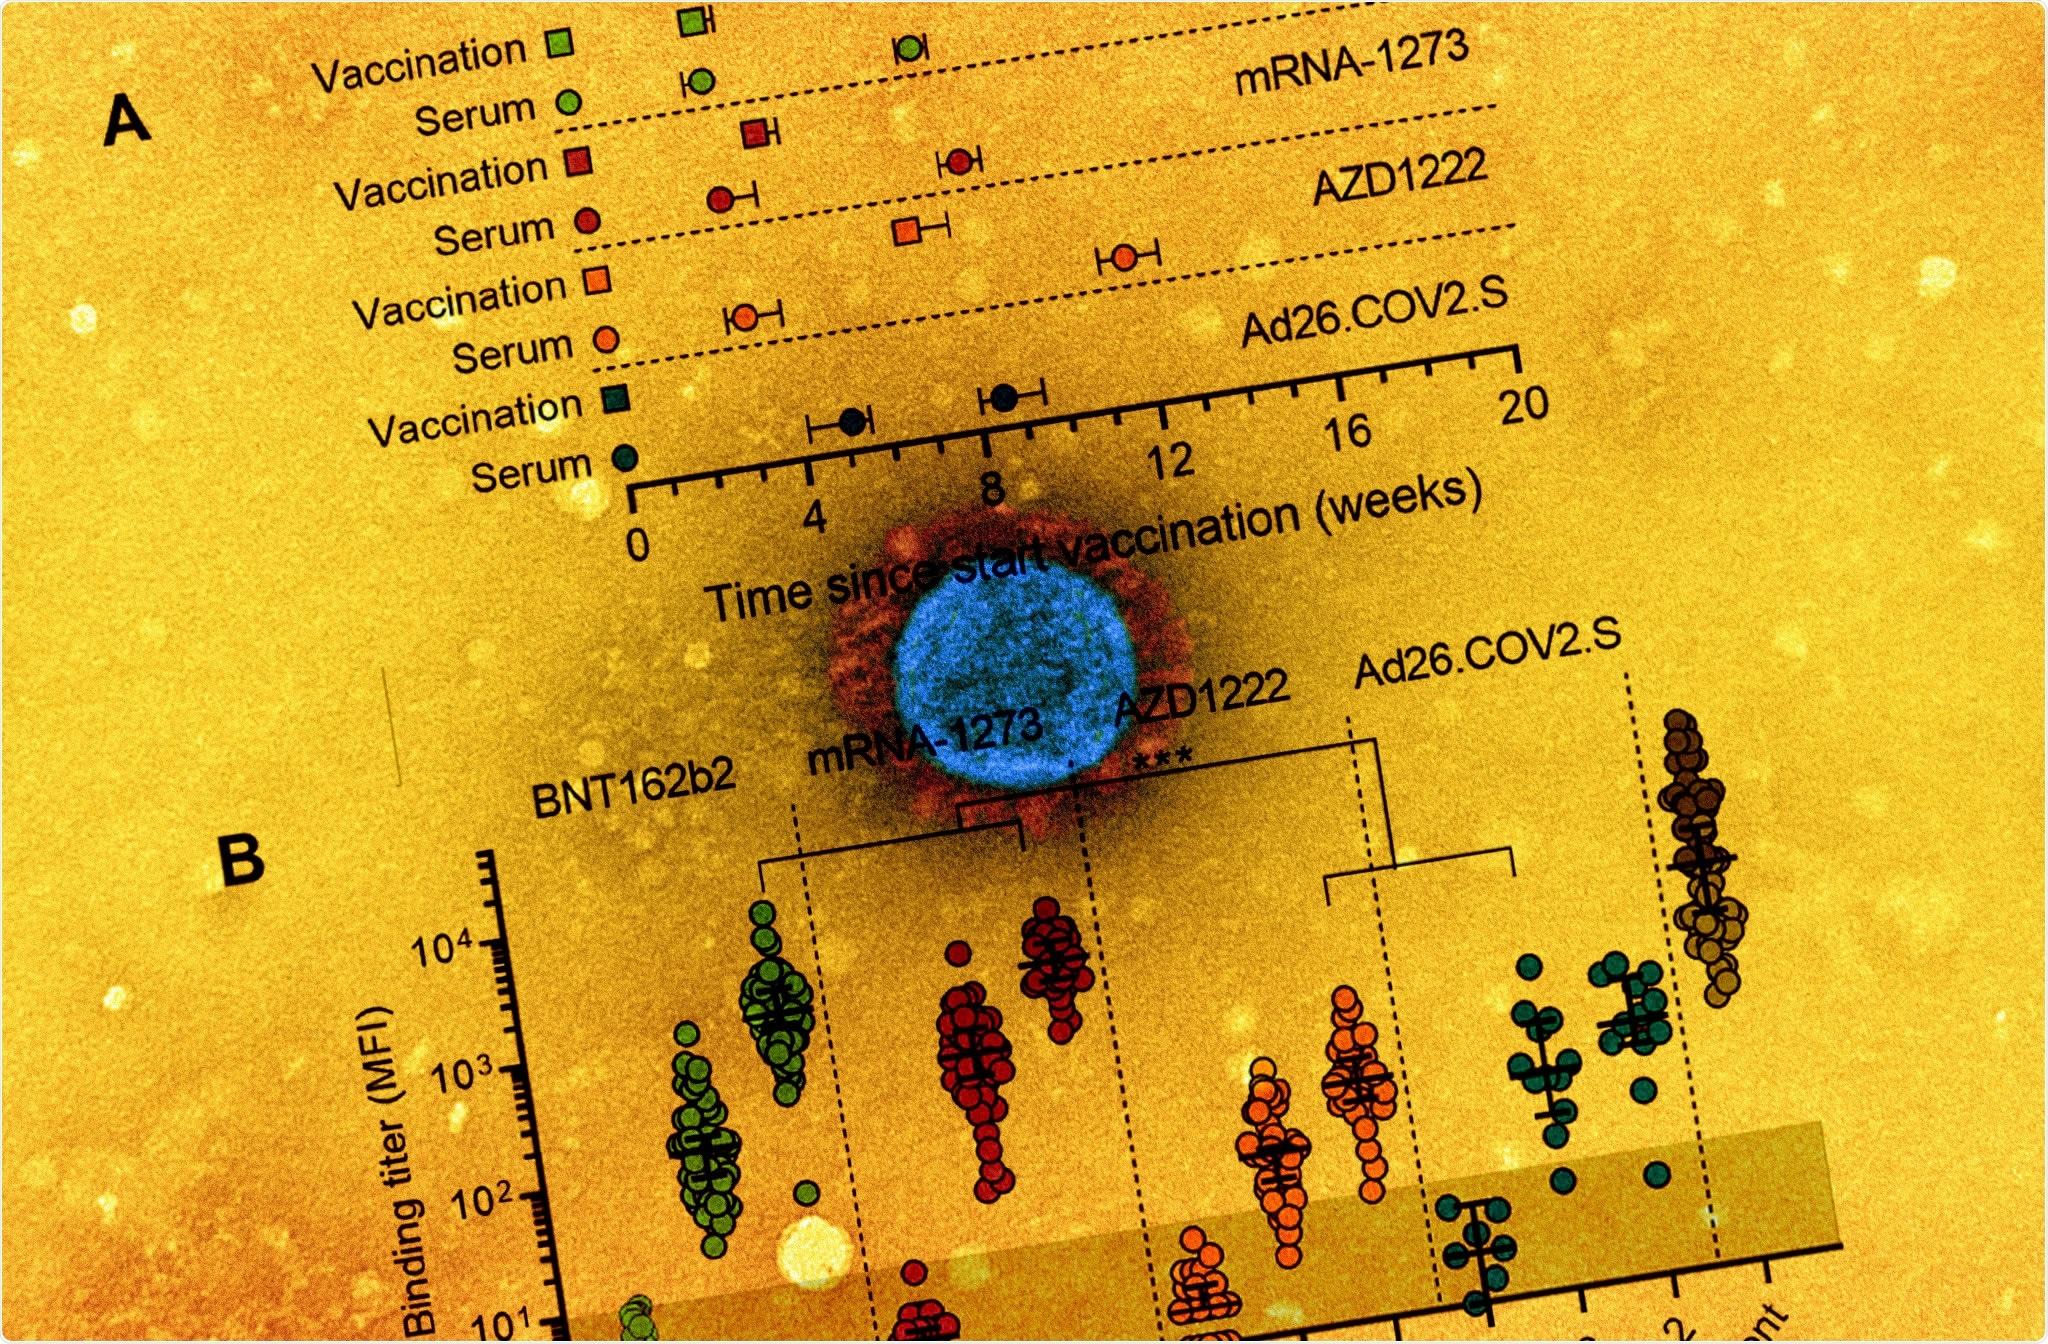 Study: Four SARS-CoV-2 vaccines induce quantitatively different antibody responses against SARS-CoV-2 variants. Image Credit: NIAID